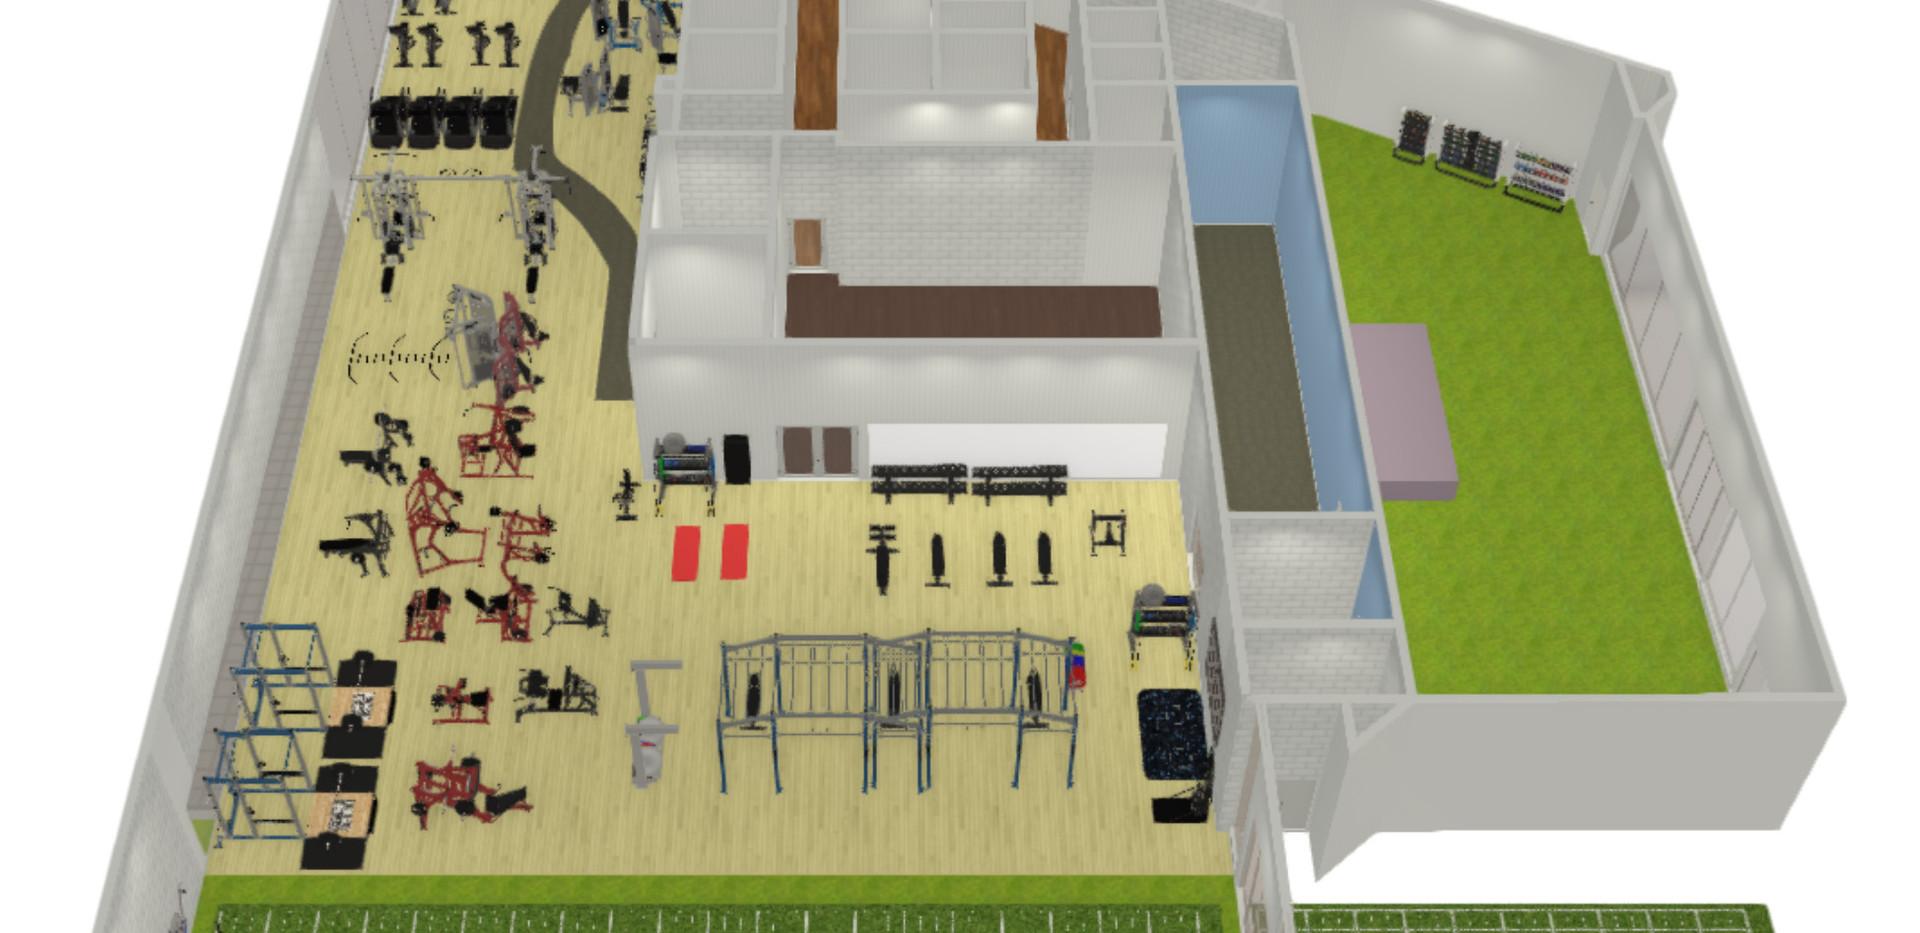 Stadium Fitness Centre layout